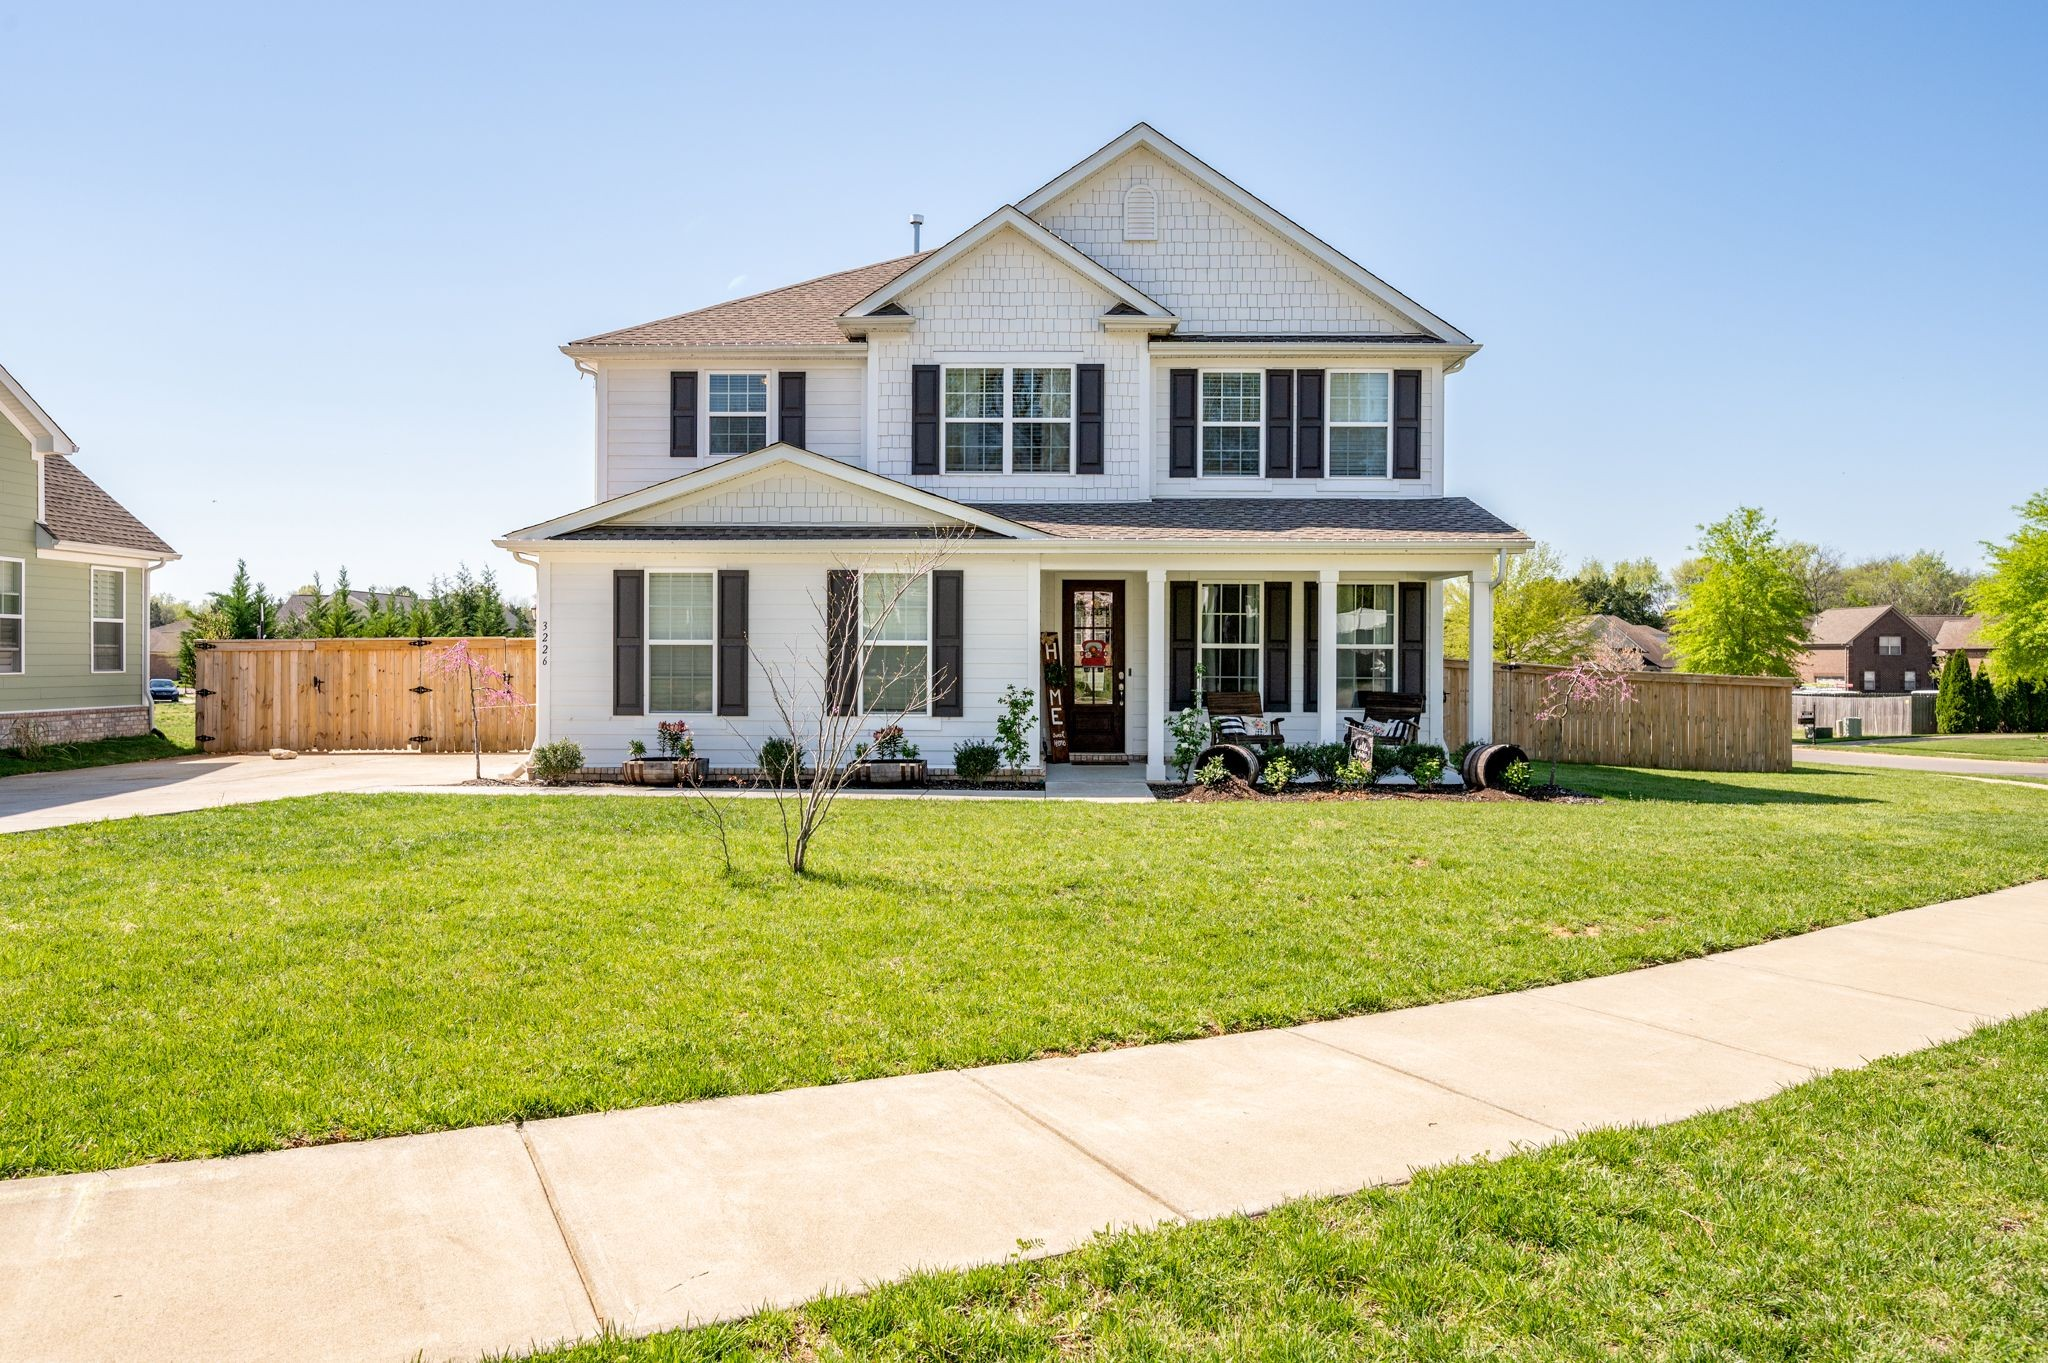 3226 Chinoe Dr Property Photo - Murfreesboro, TN real estate listing